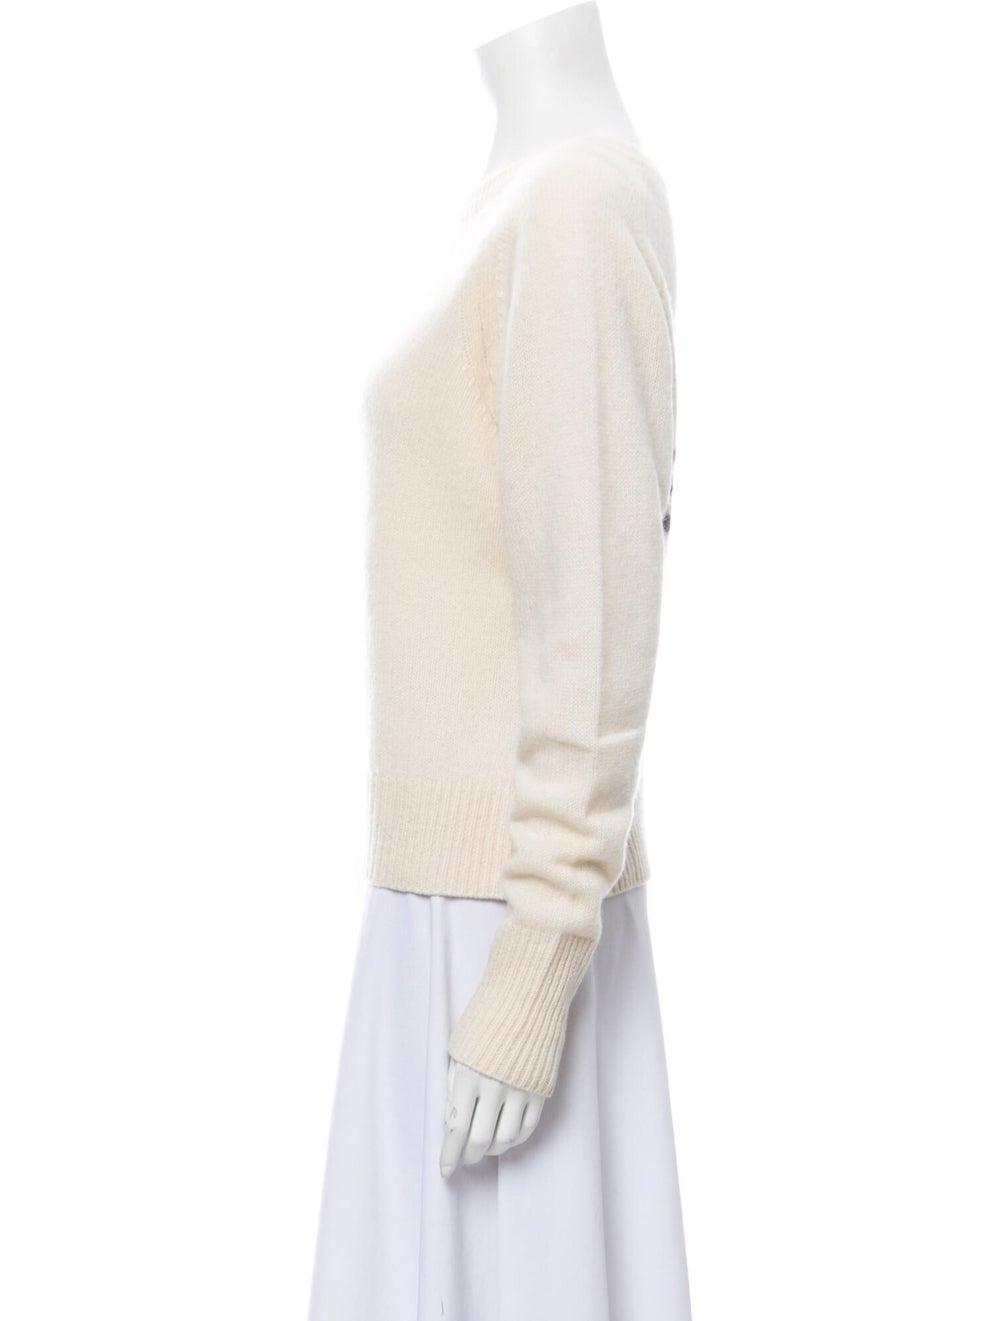 Skull Cashmere Cashmere Scoop Neck Sweater - image 2